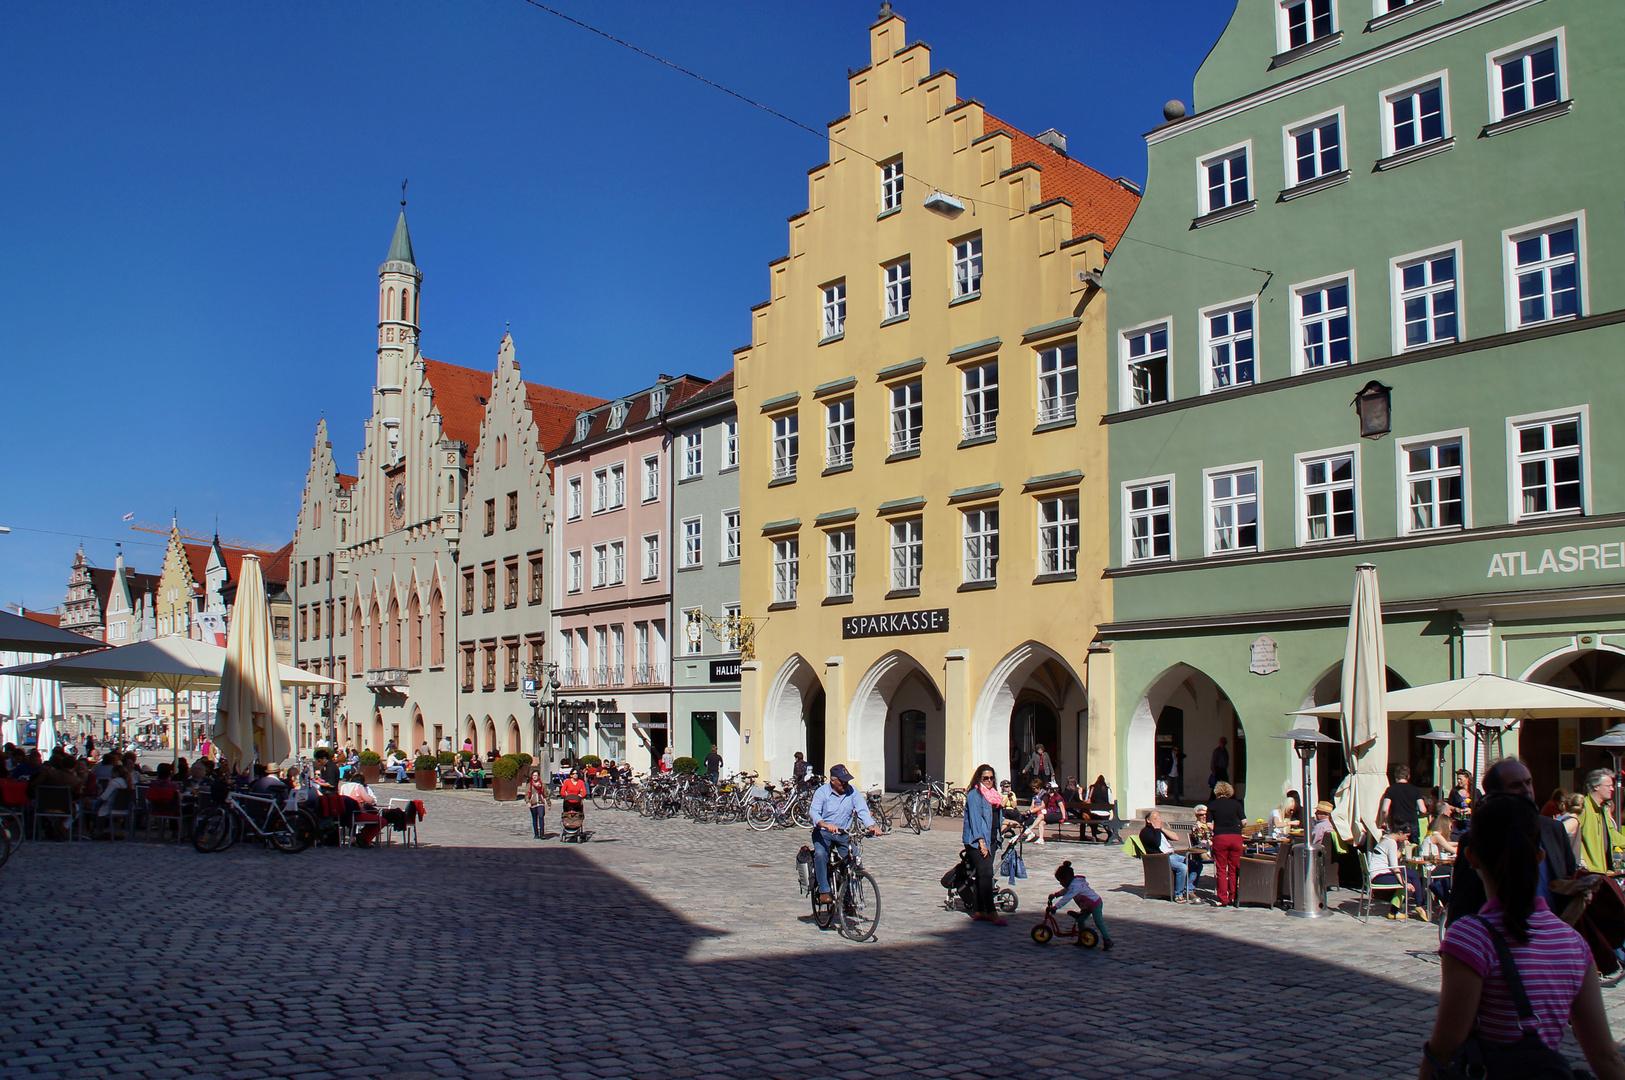 Landshut Altstadt im Frühling